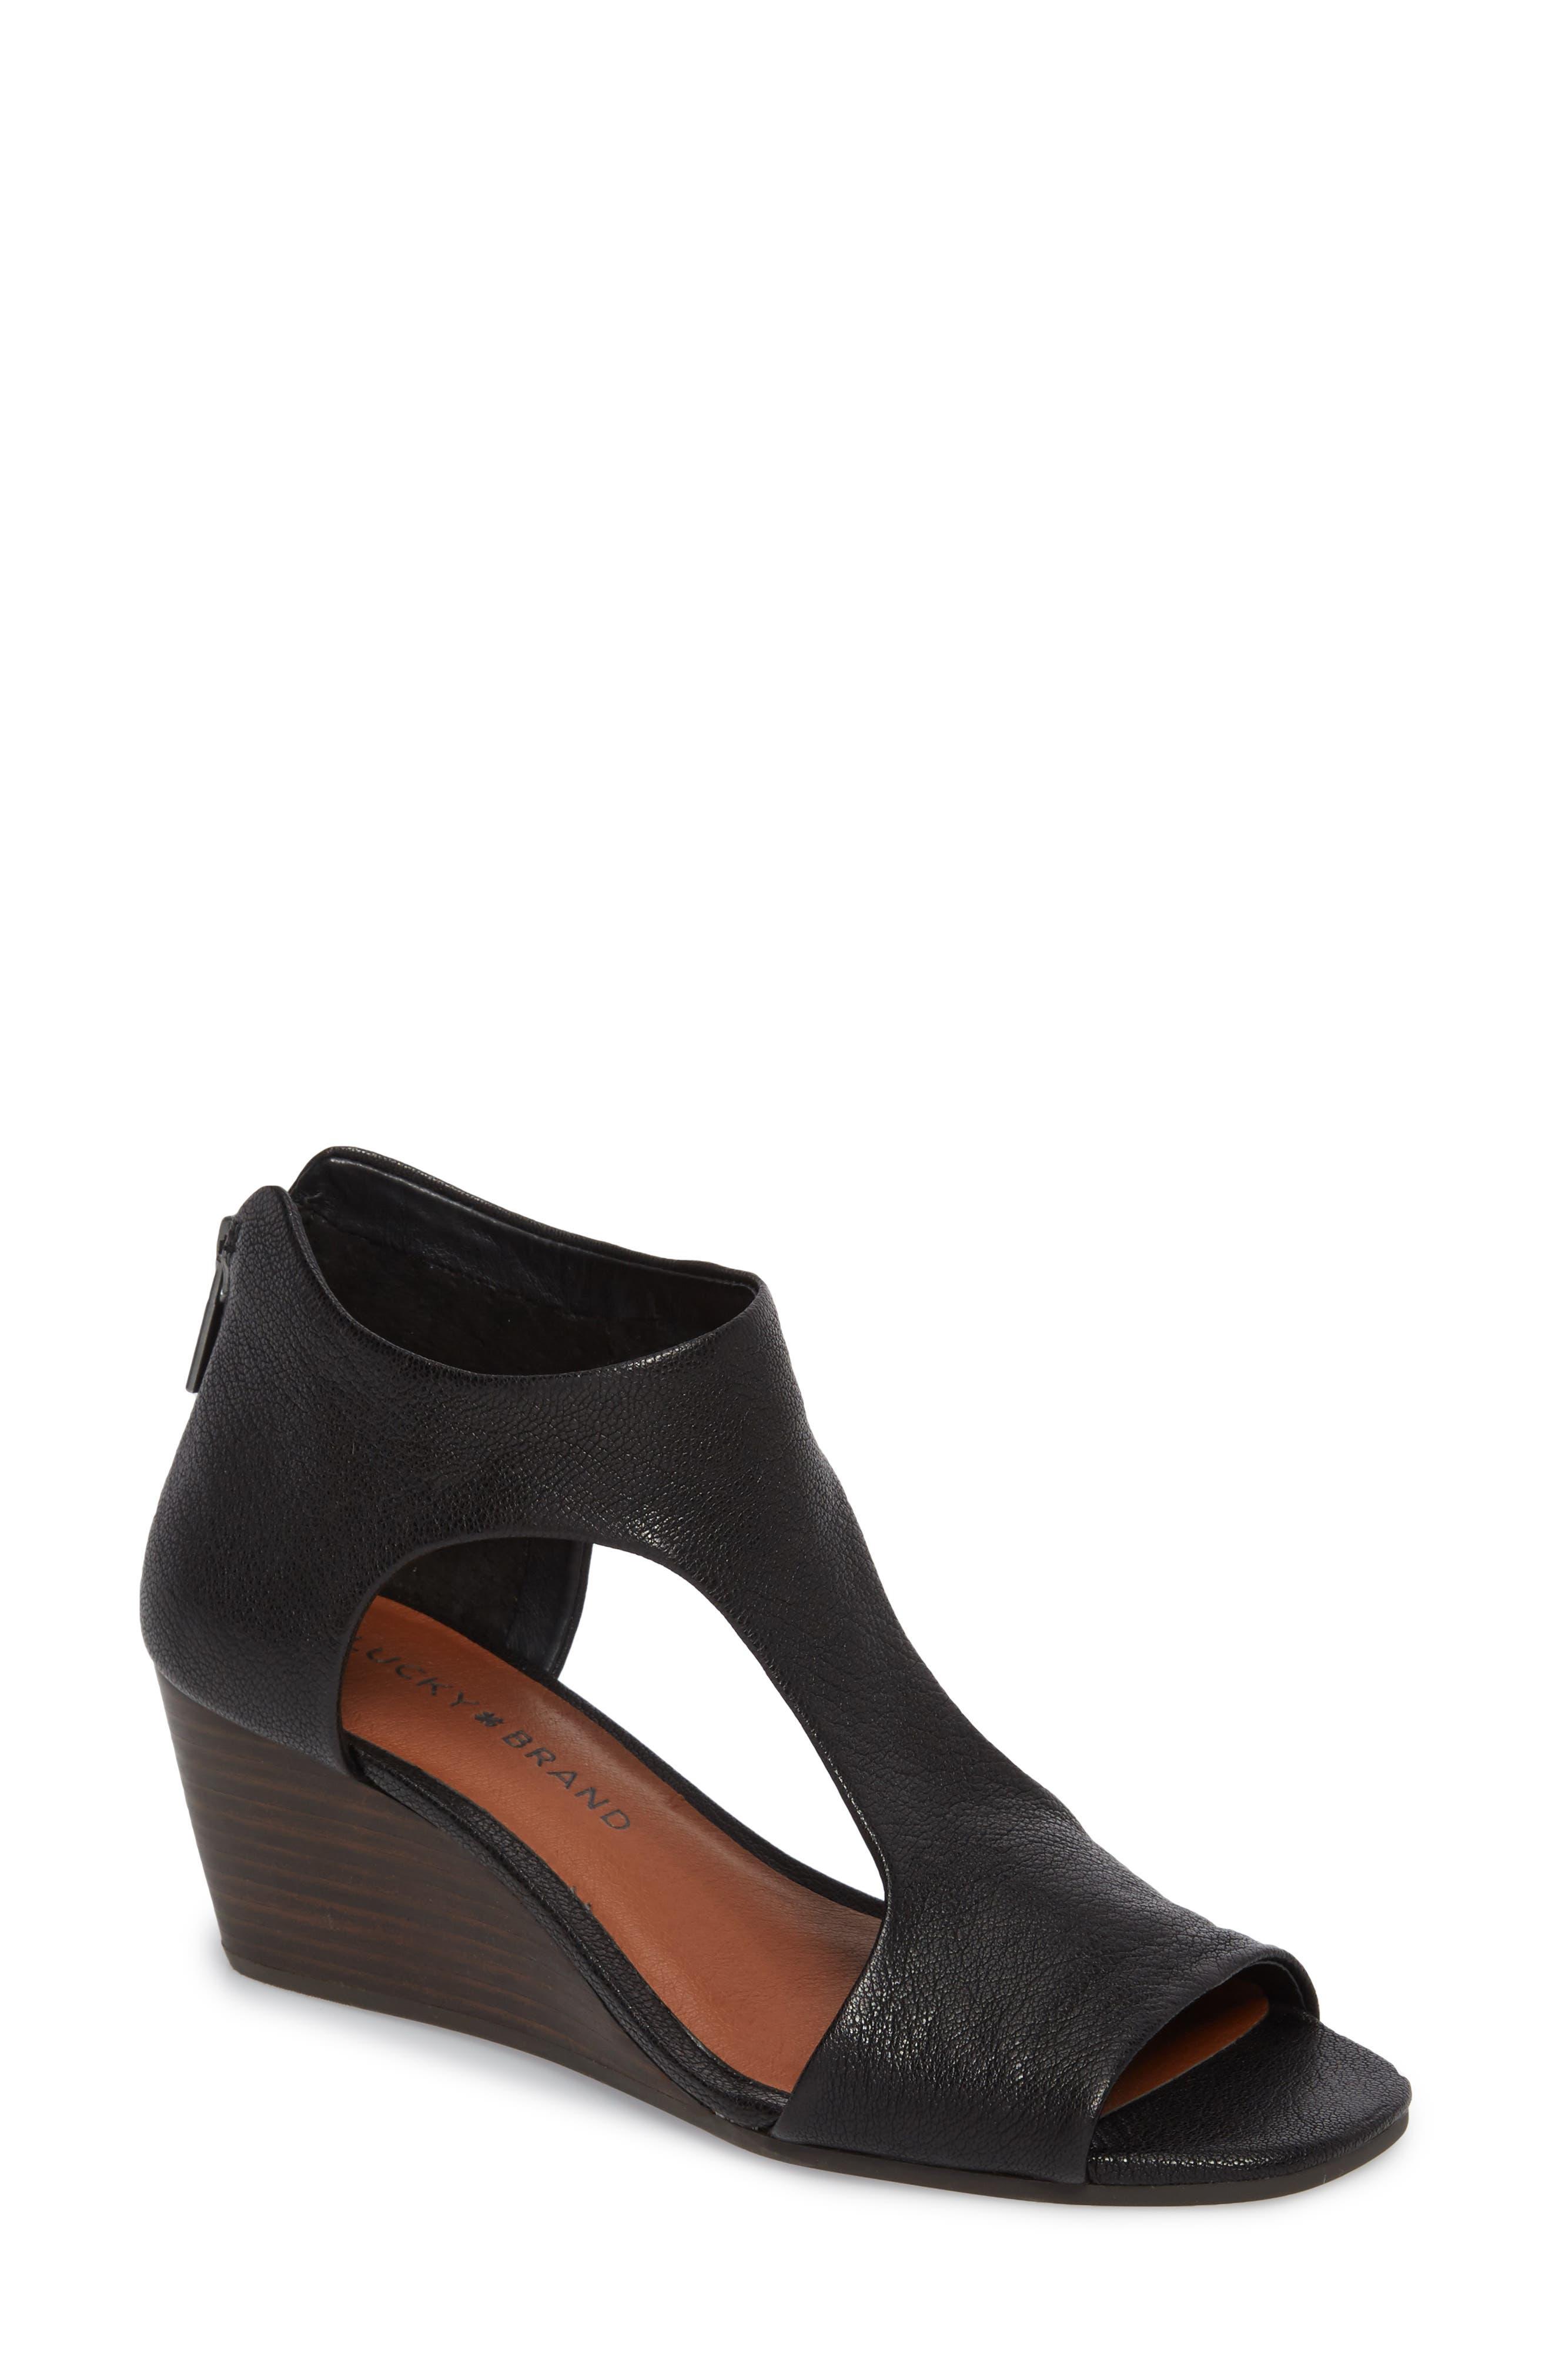 Tehirr Wedge Sandal,                         Main,                         color, 001